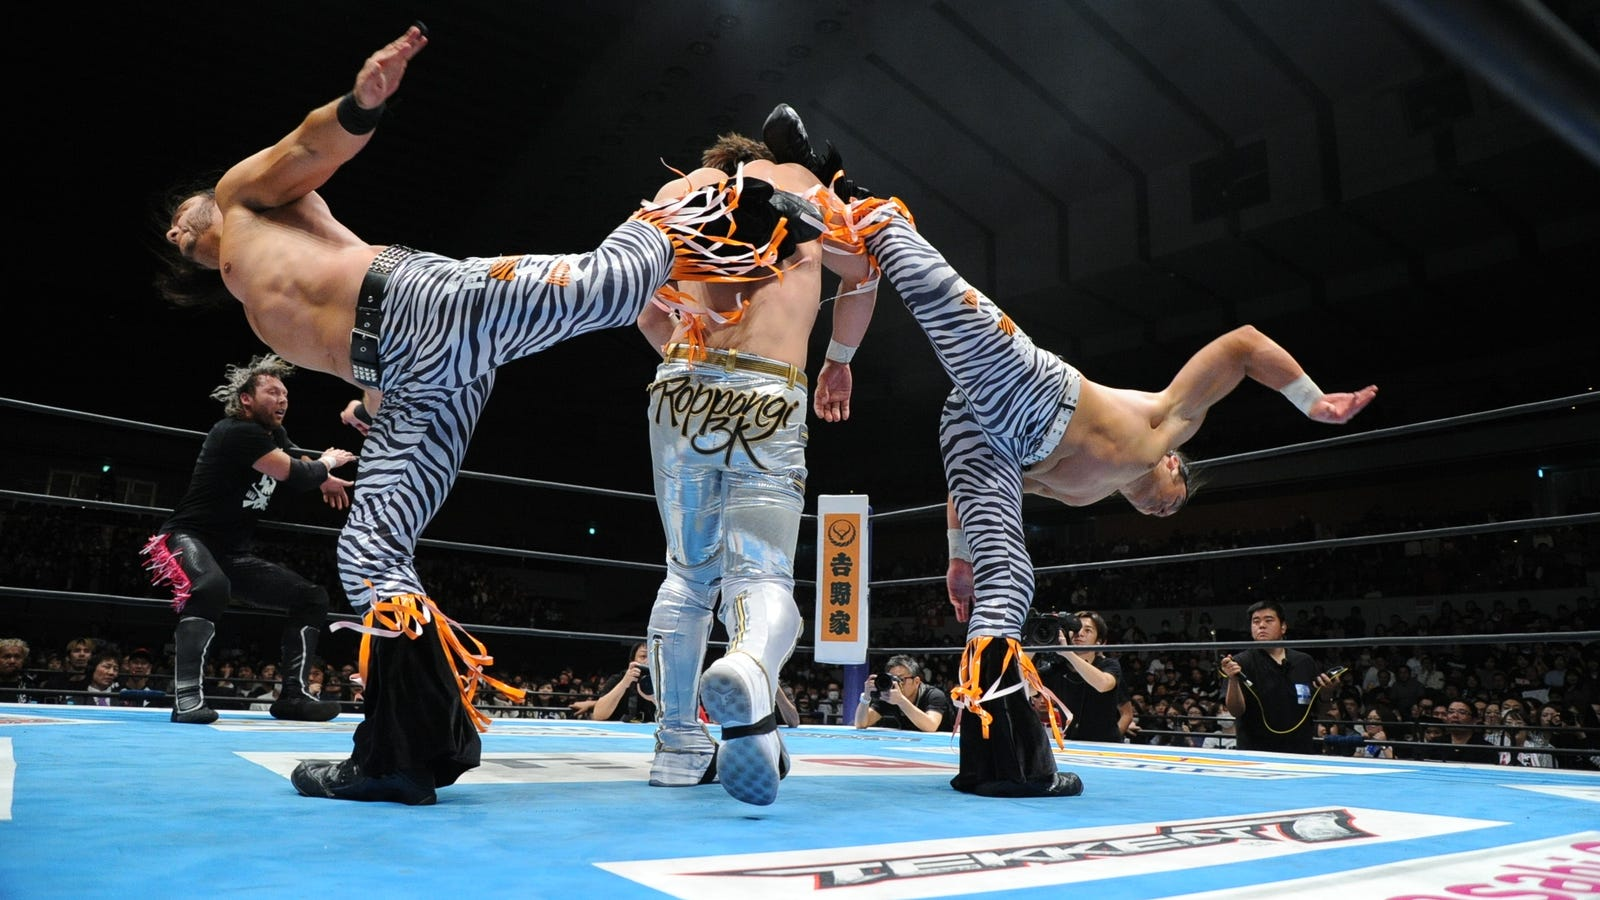 Show Wrestling